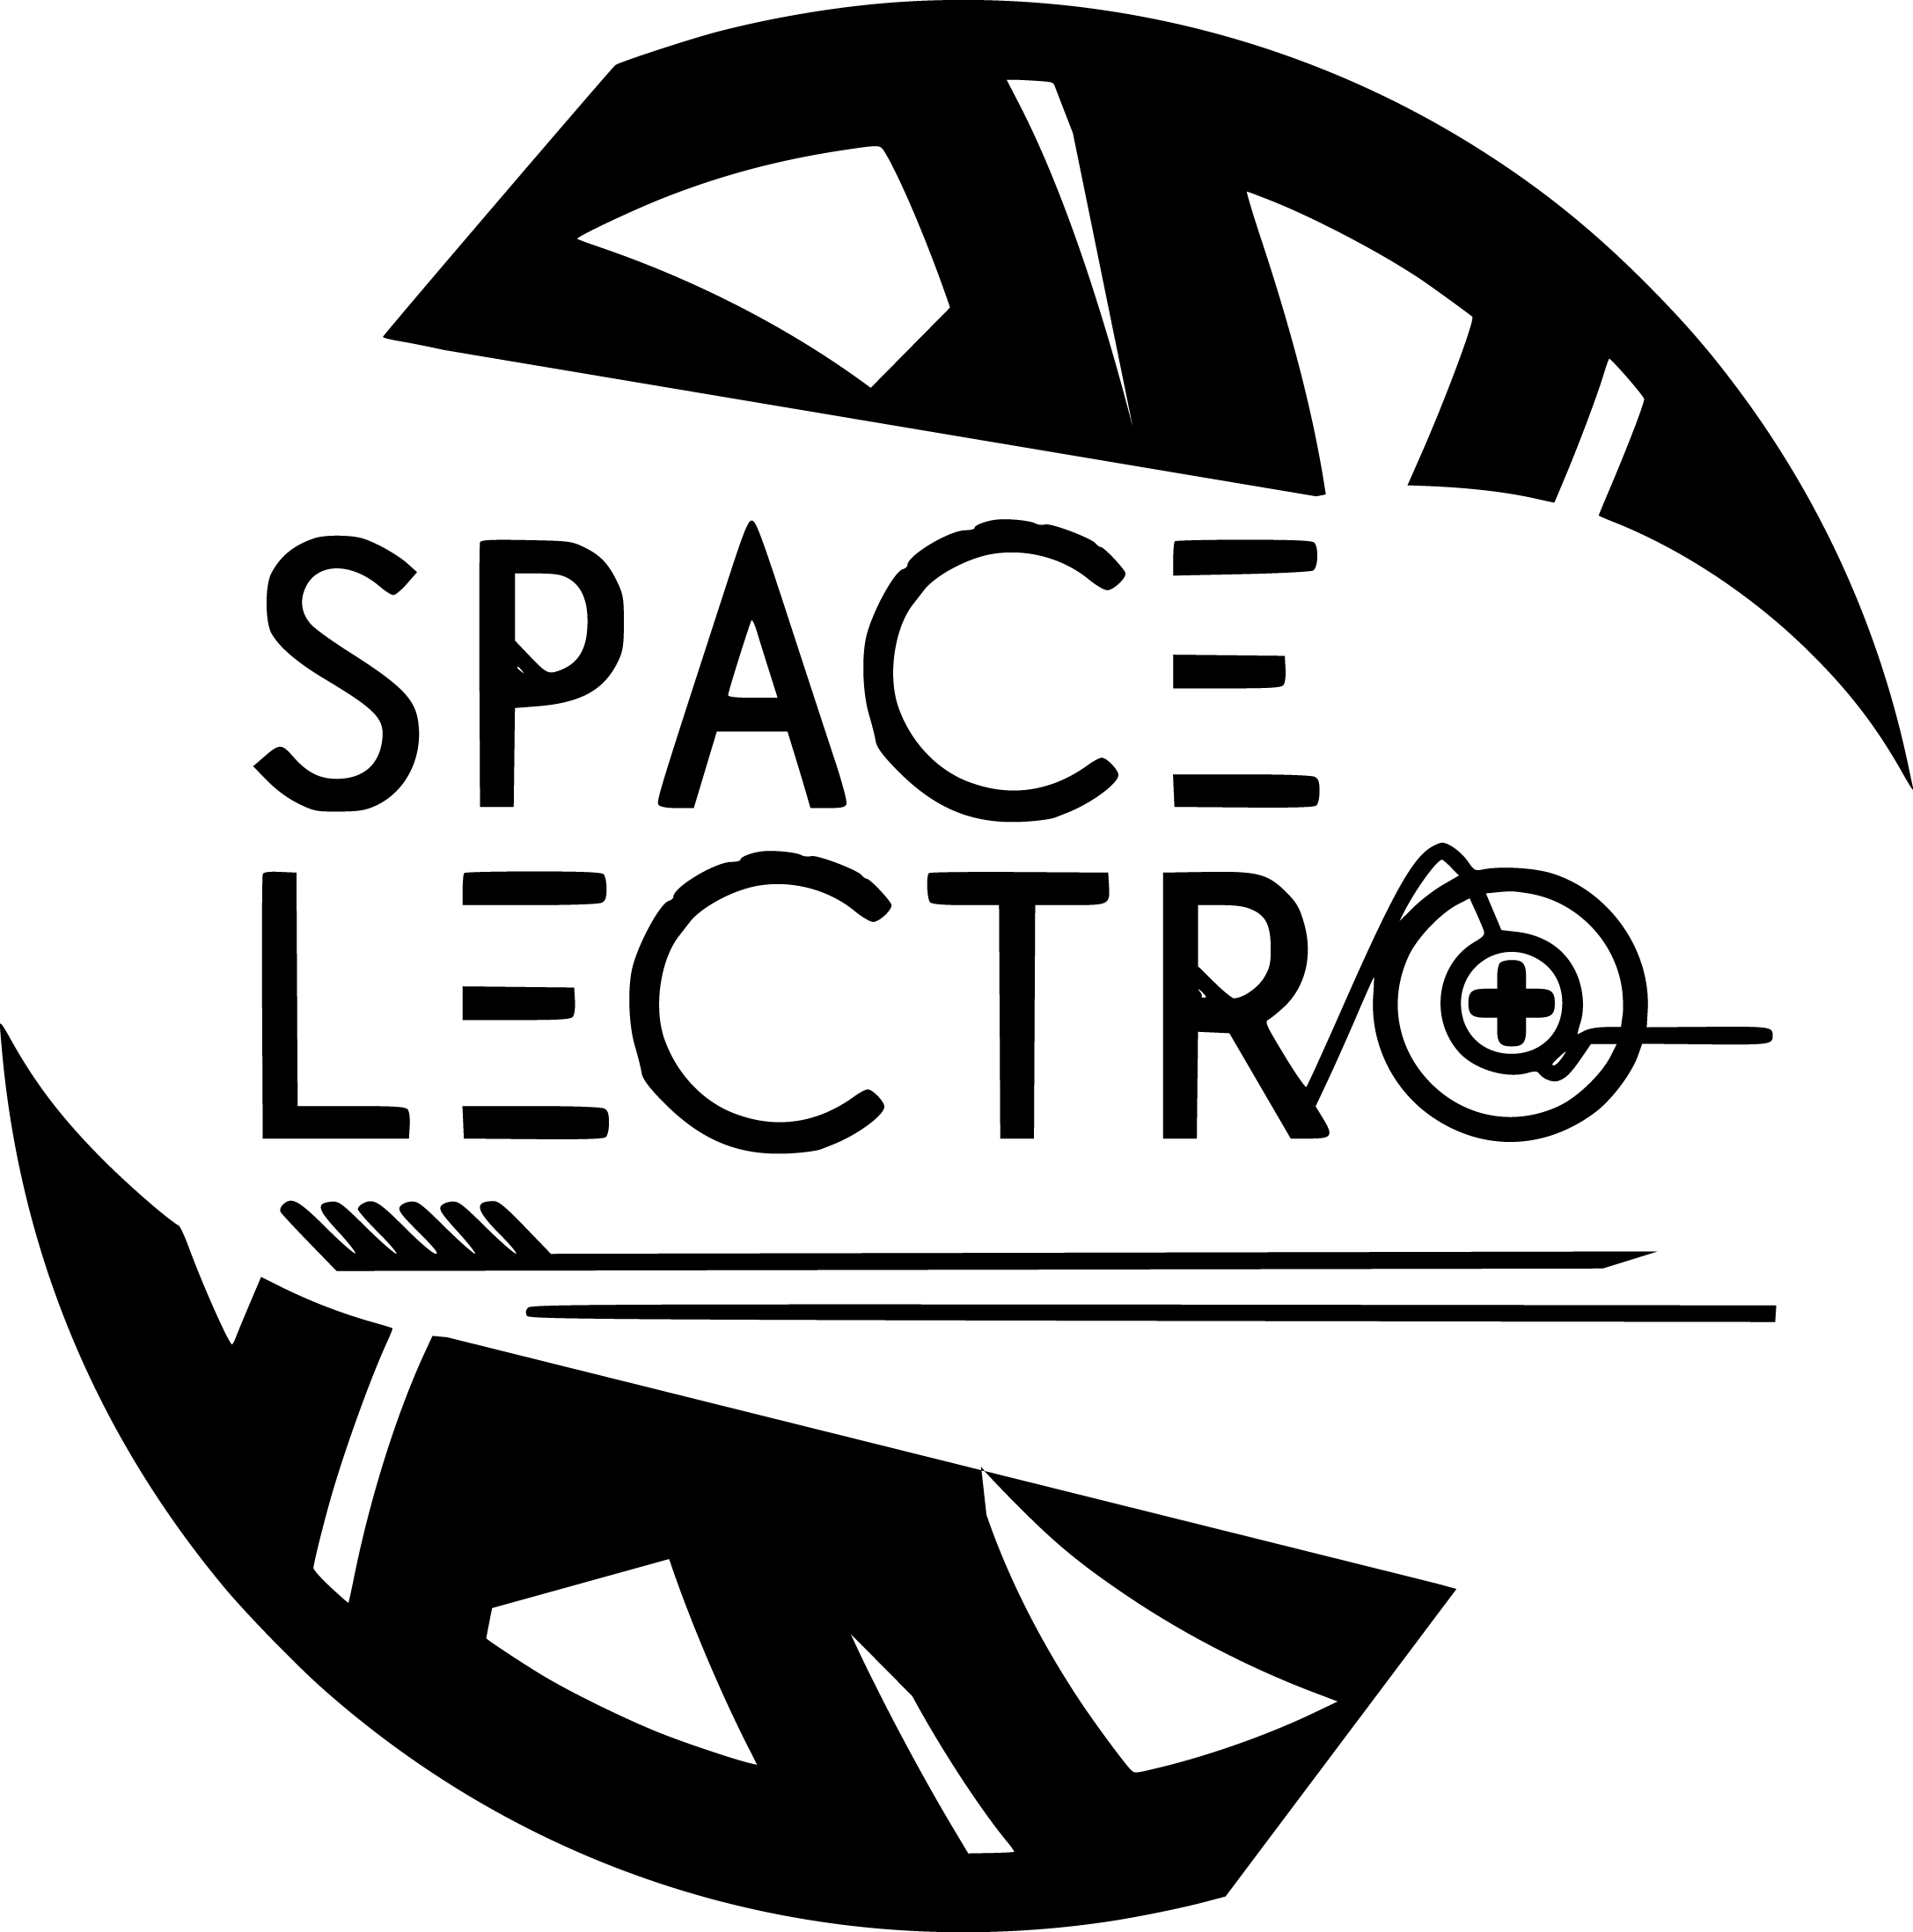 Spacelectro